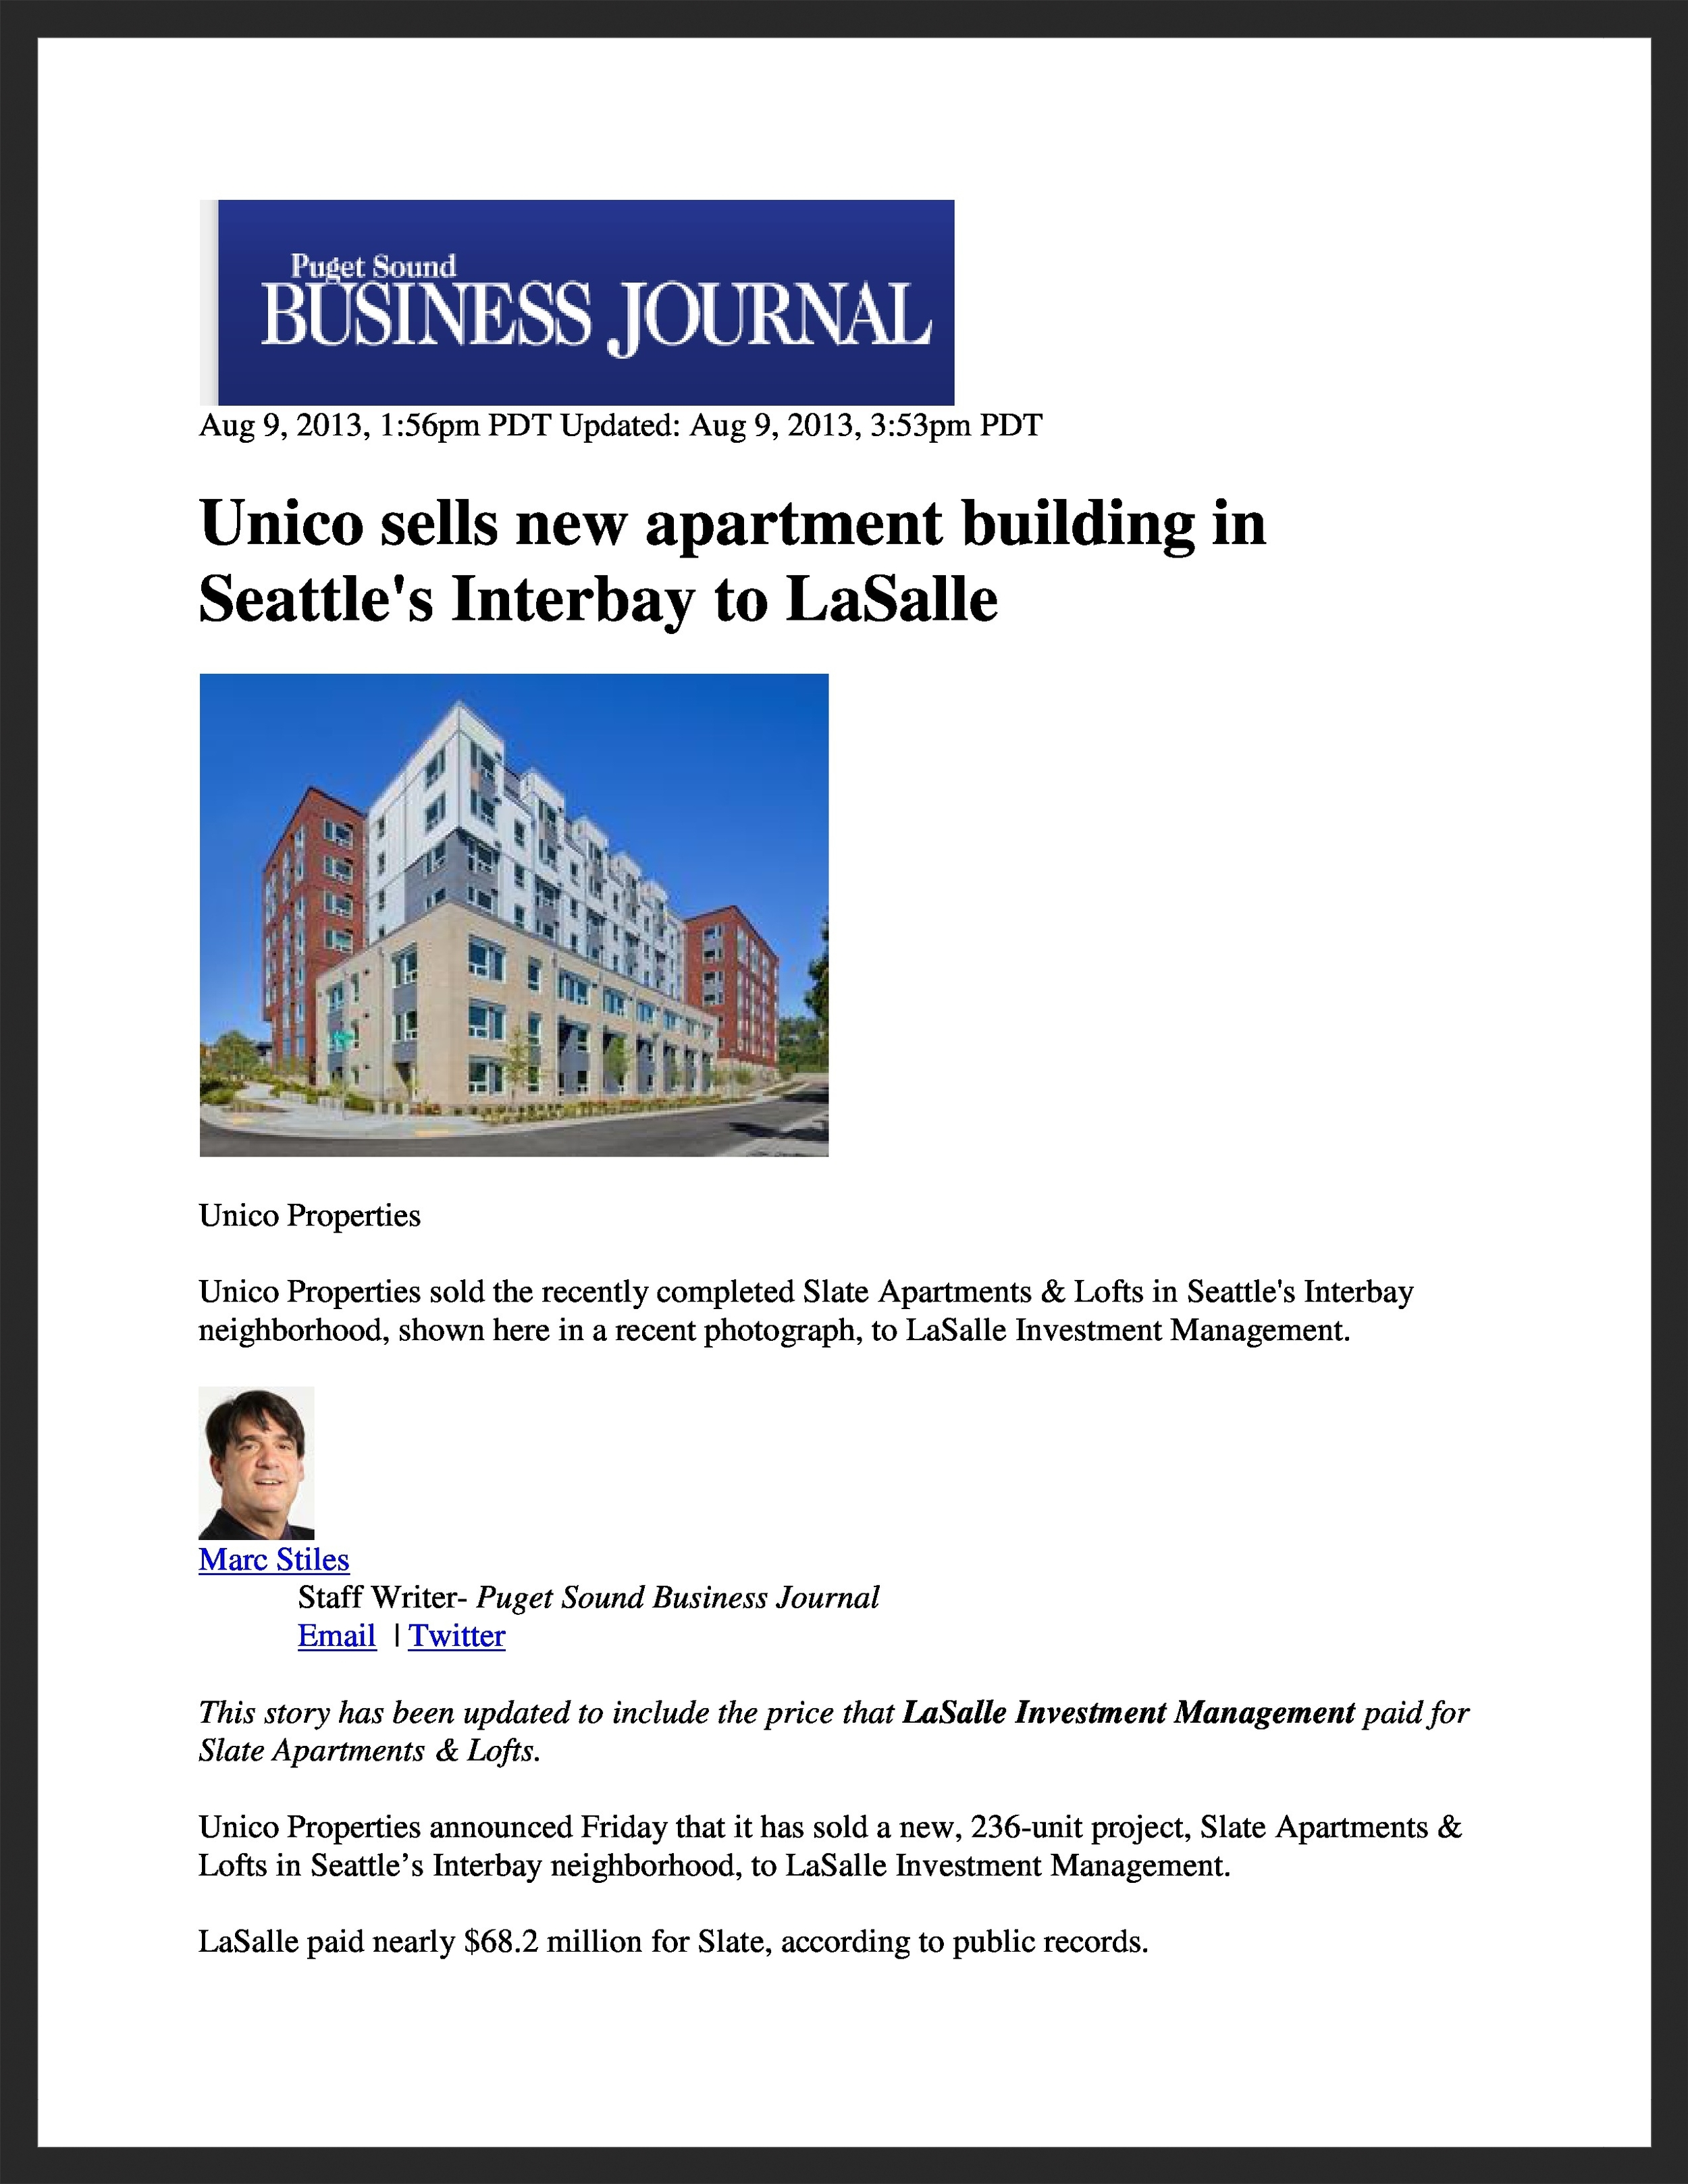 UNICO  Puget Sound Business Journal  08.09.2013